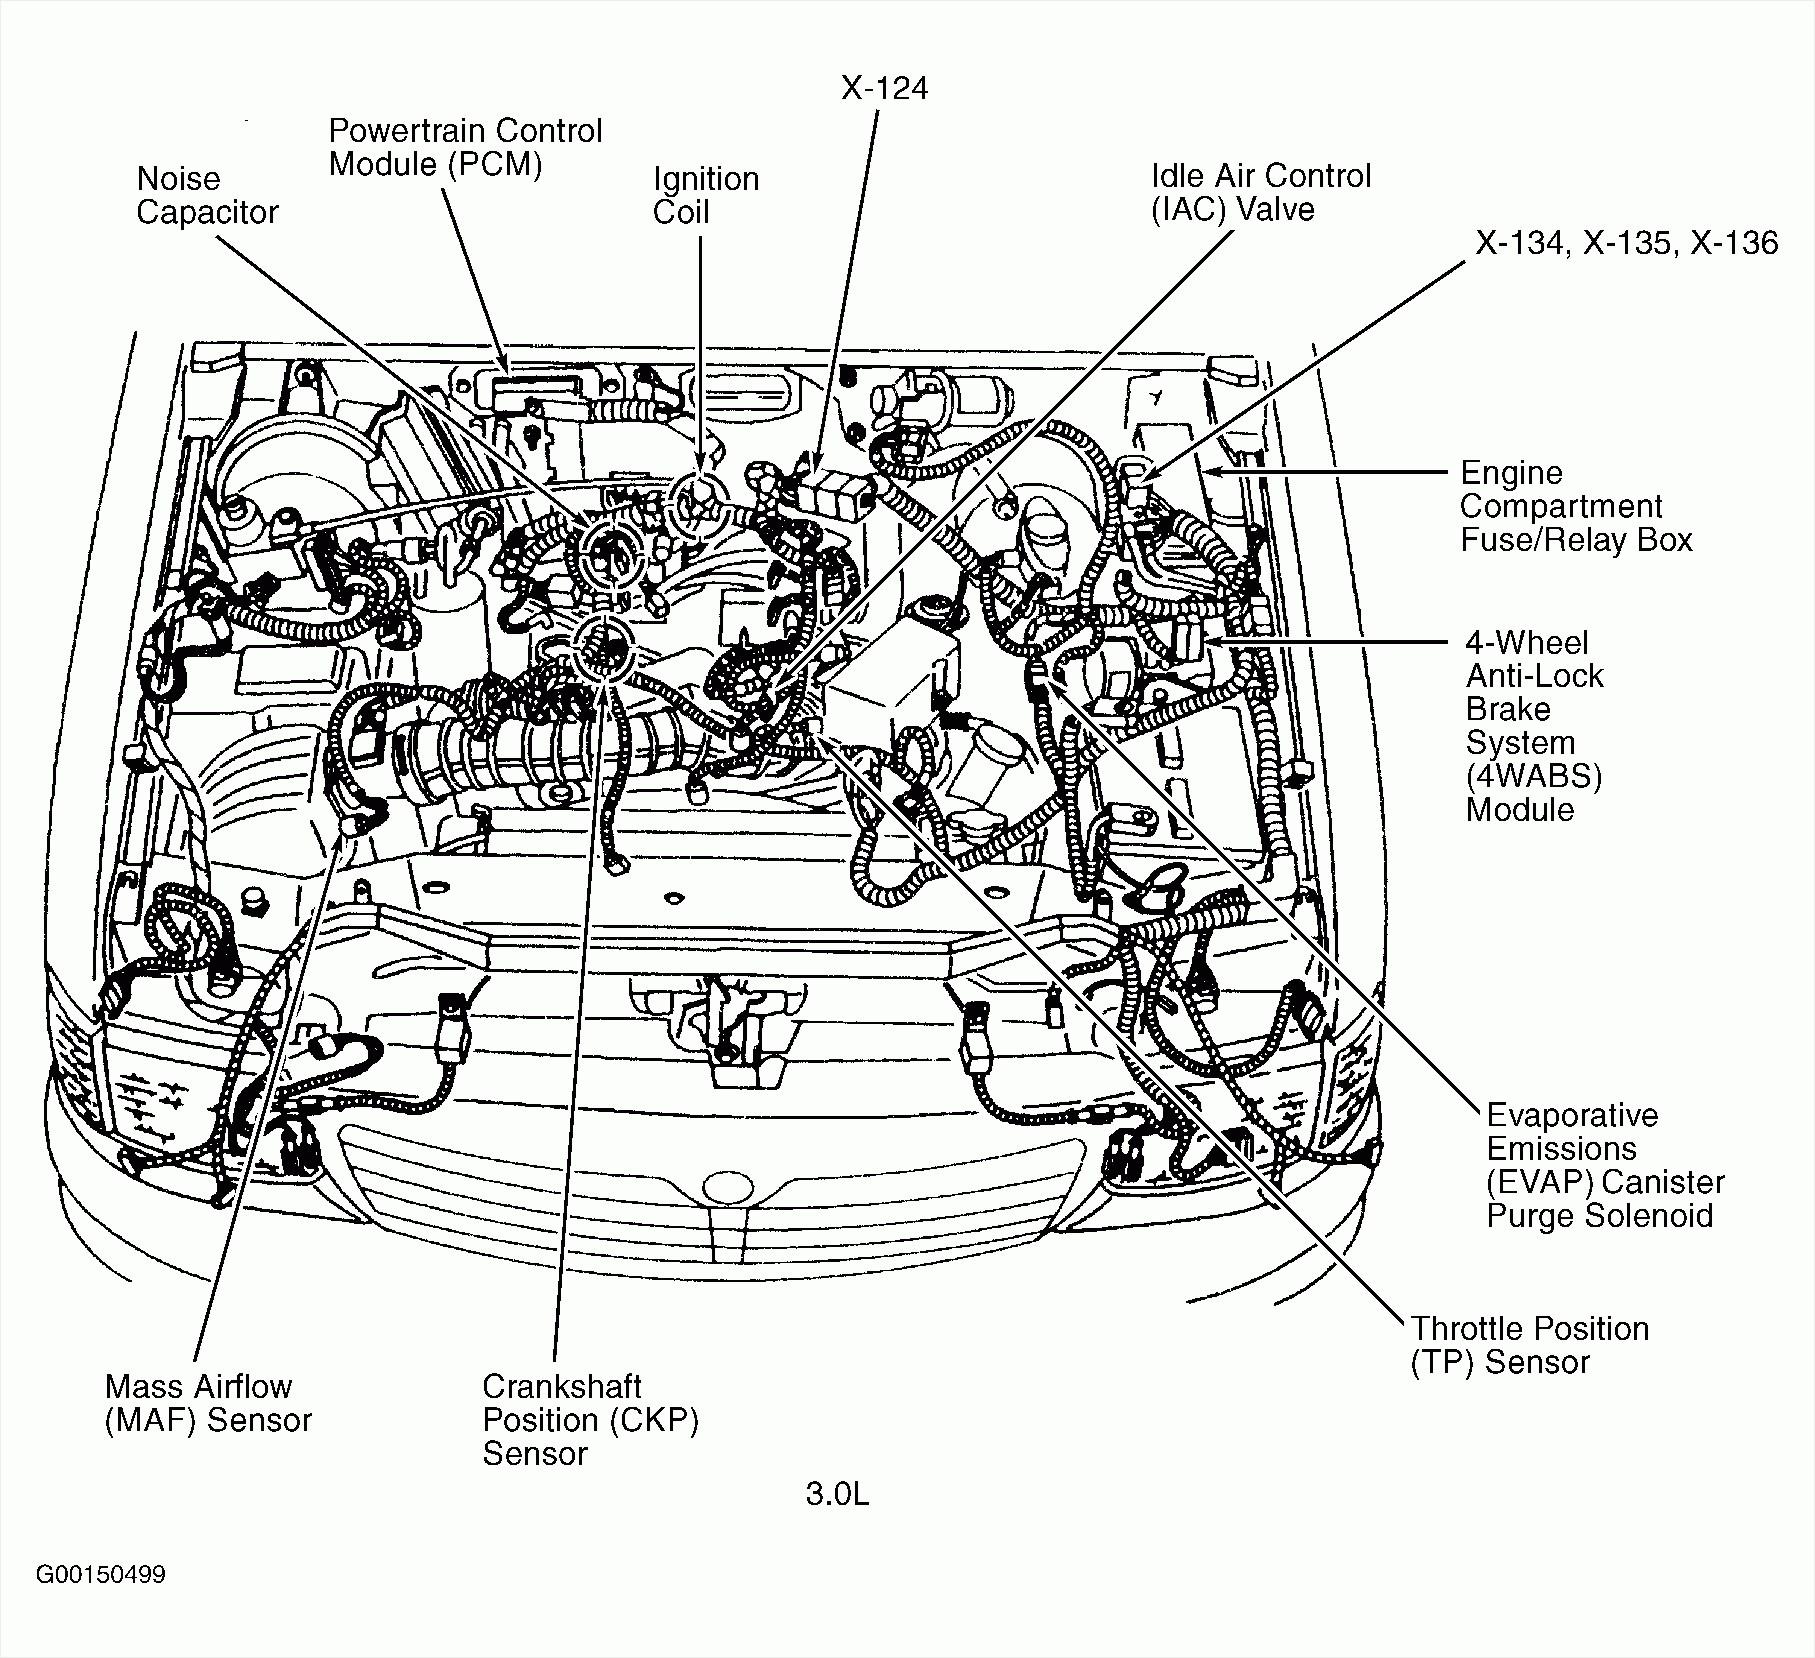 2001 chevy blazer ls radio wiring diagram chevrolet colorado 05 f250 6 0 engine - best site harness